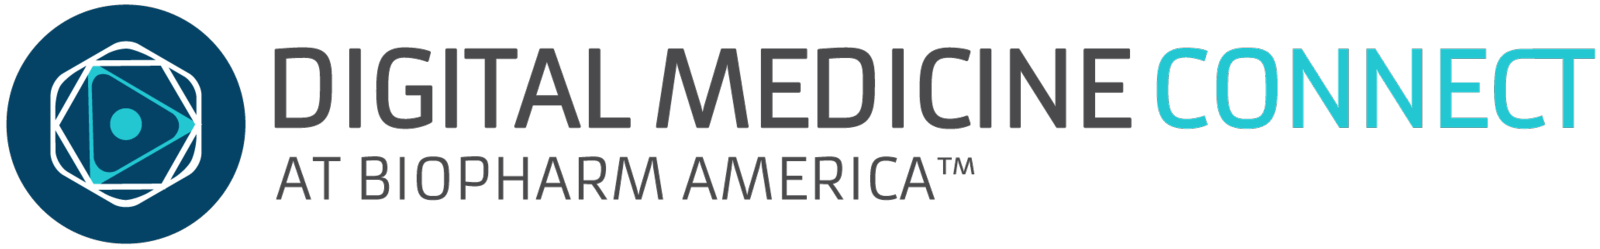 Digital Medicine Connect at BioPharm America | September 15, 2016 | Boston, MA